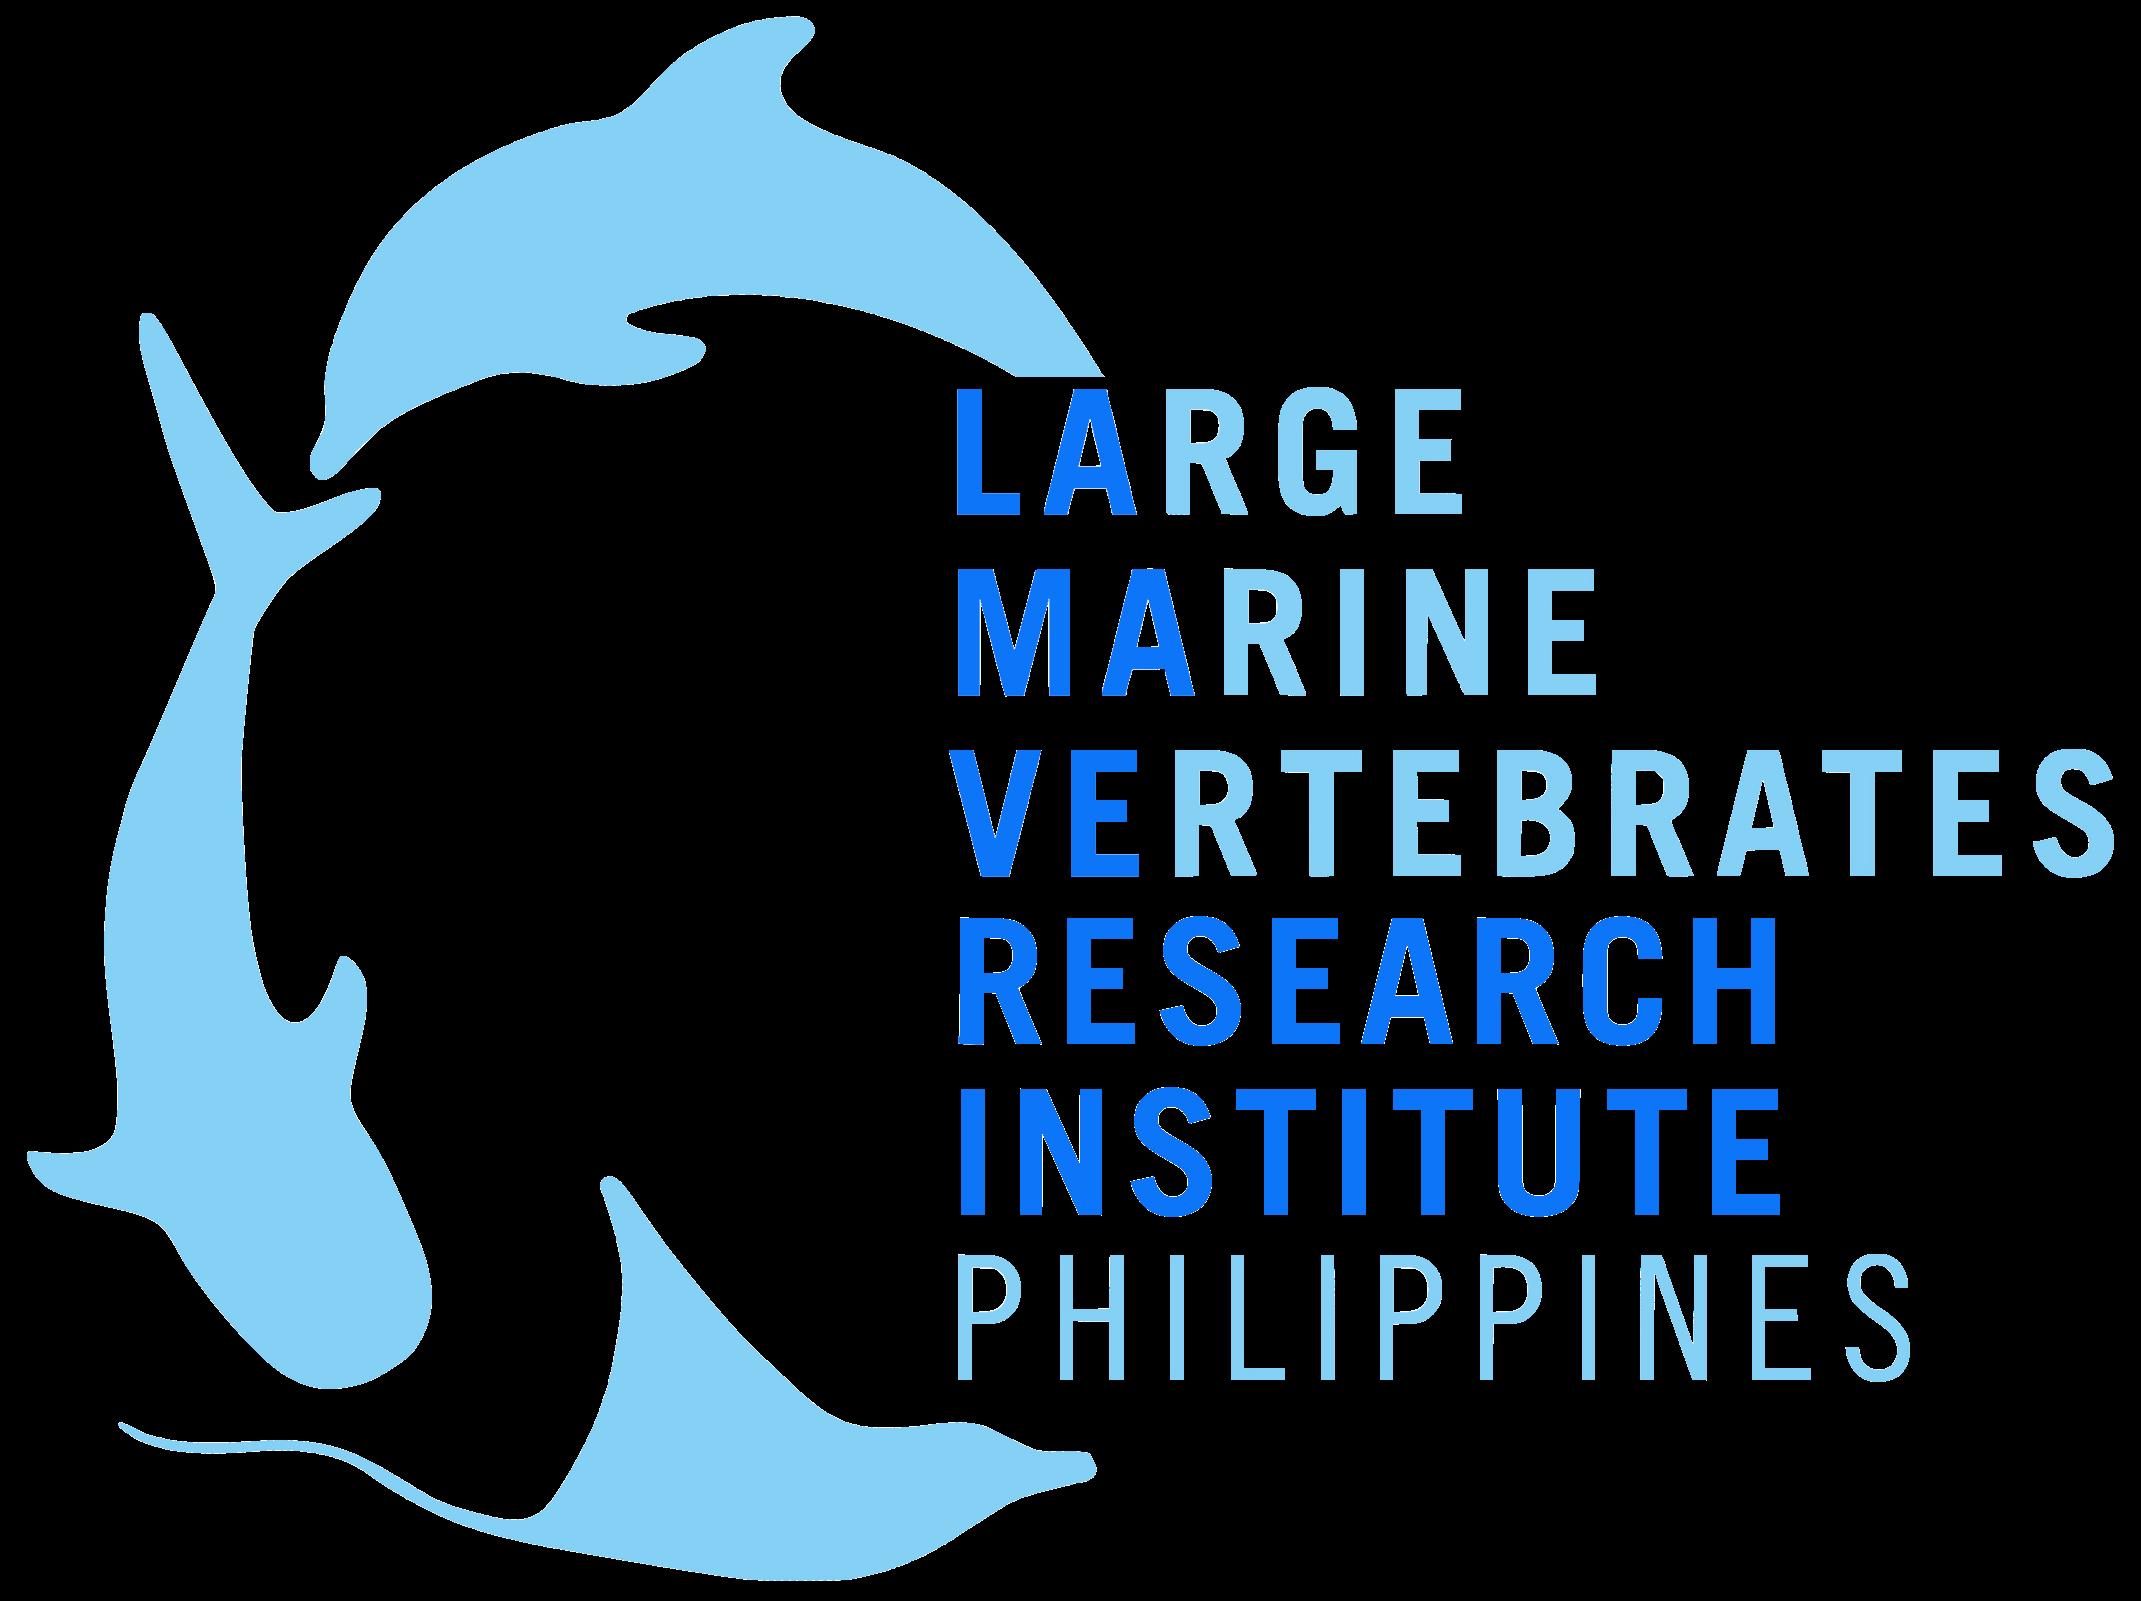 large-marine-vertebrates-research-institute-philippines-logo-lamave.png